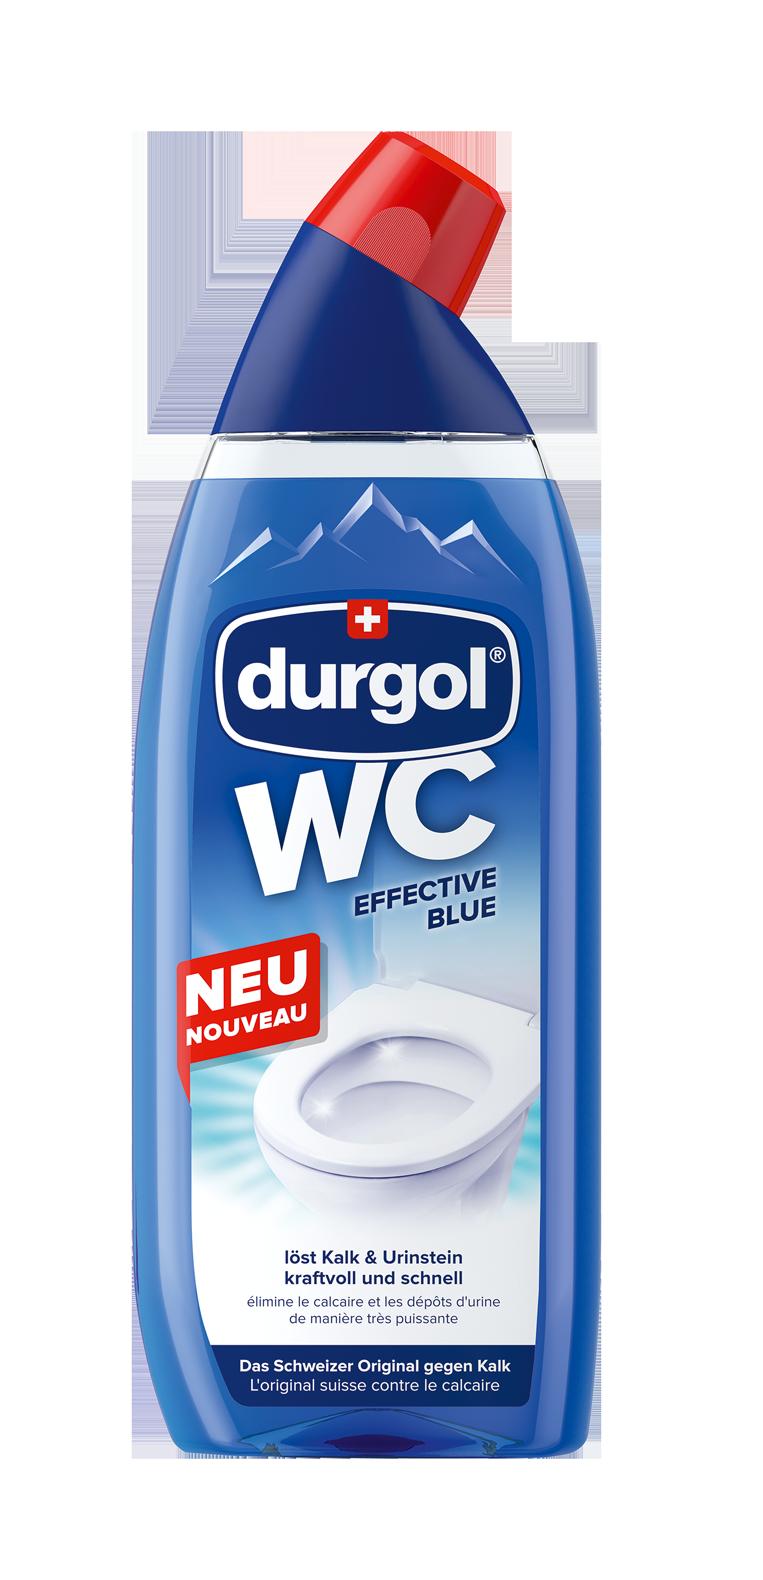 durgol WC effective blue fles